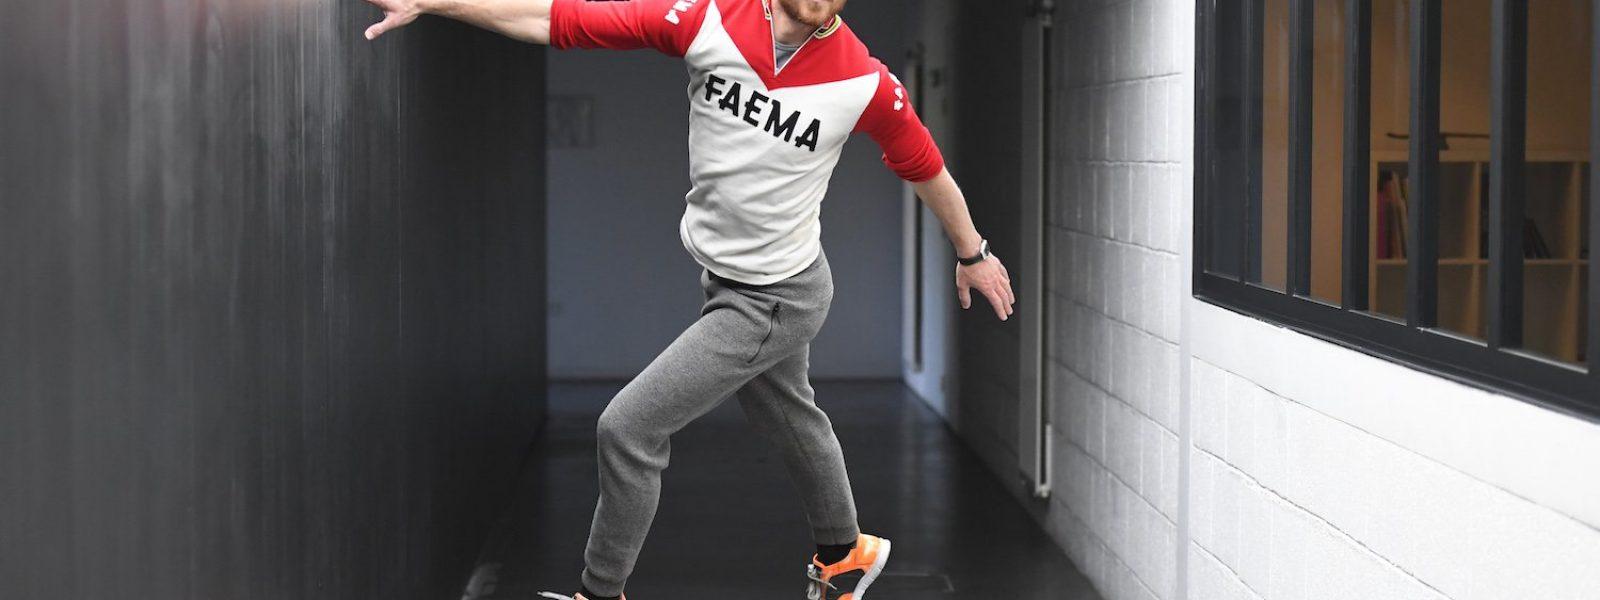 le danseur Boris Charmatz